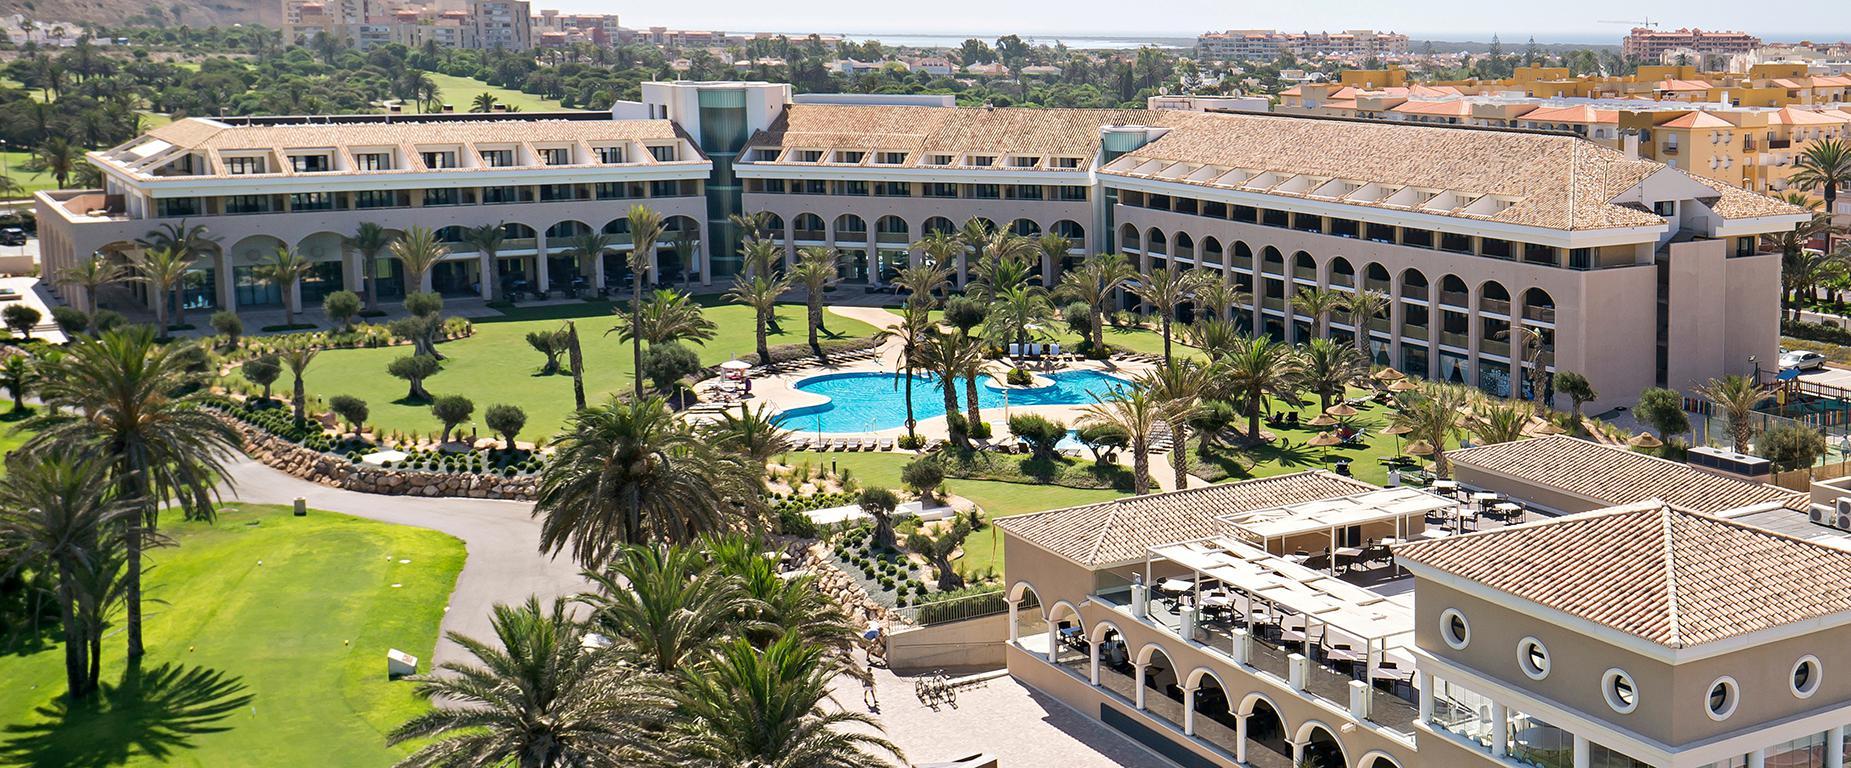 Meer info over Hotel AR Golf Almerimar  bij Sunweb zomer